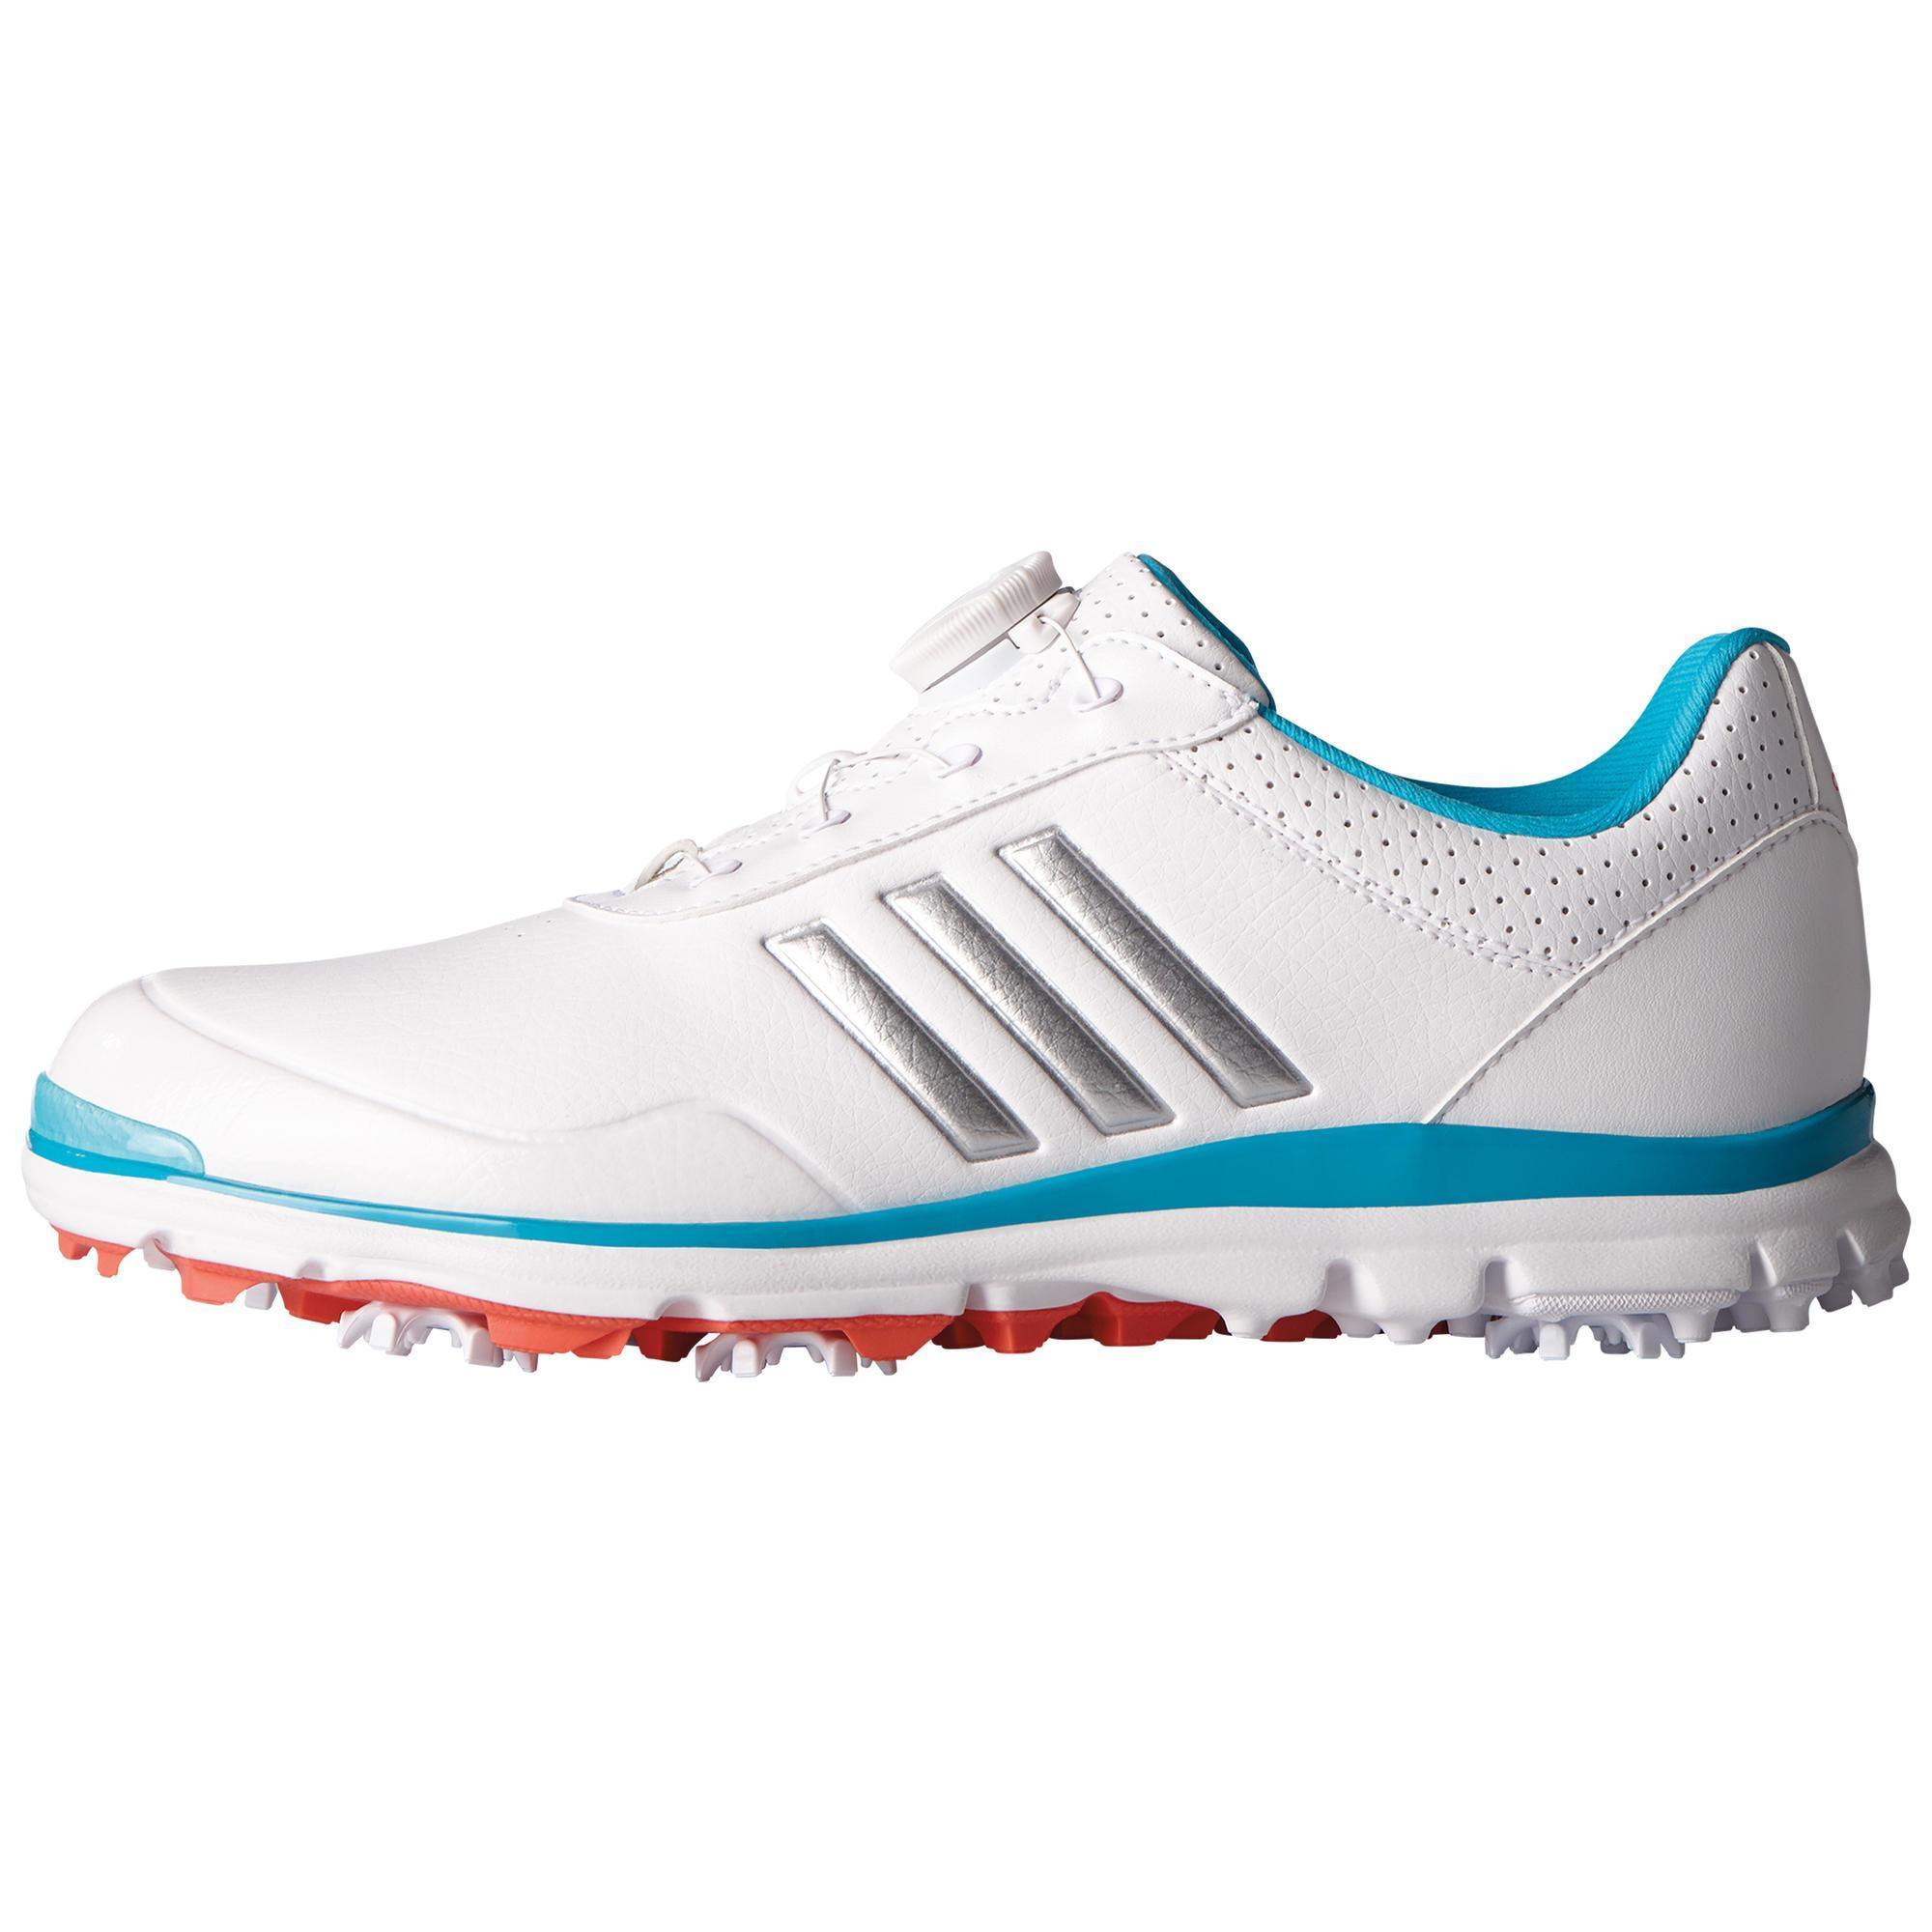 Adidas Golfschoenen Adistar Lite Boa voor dames wit